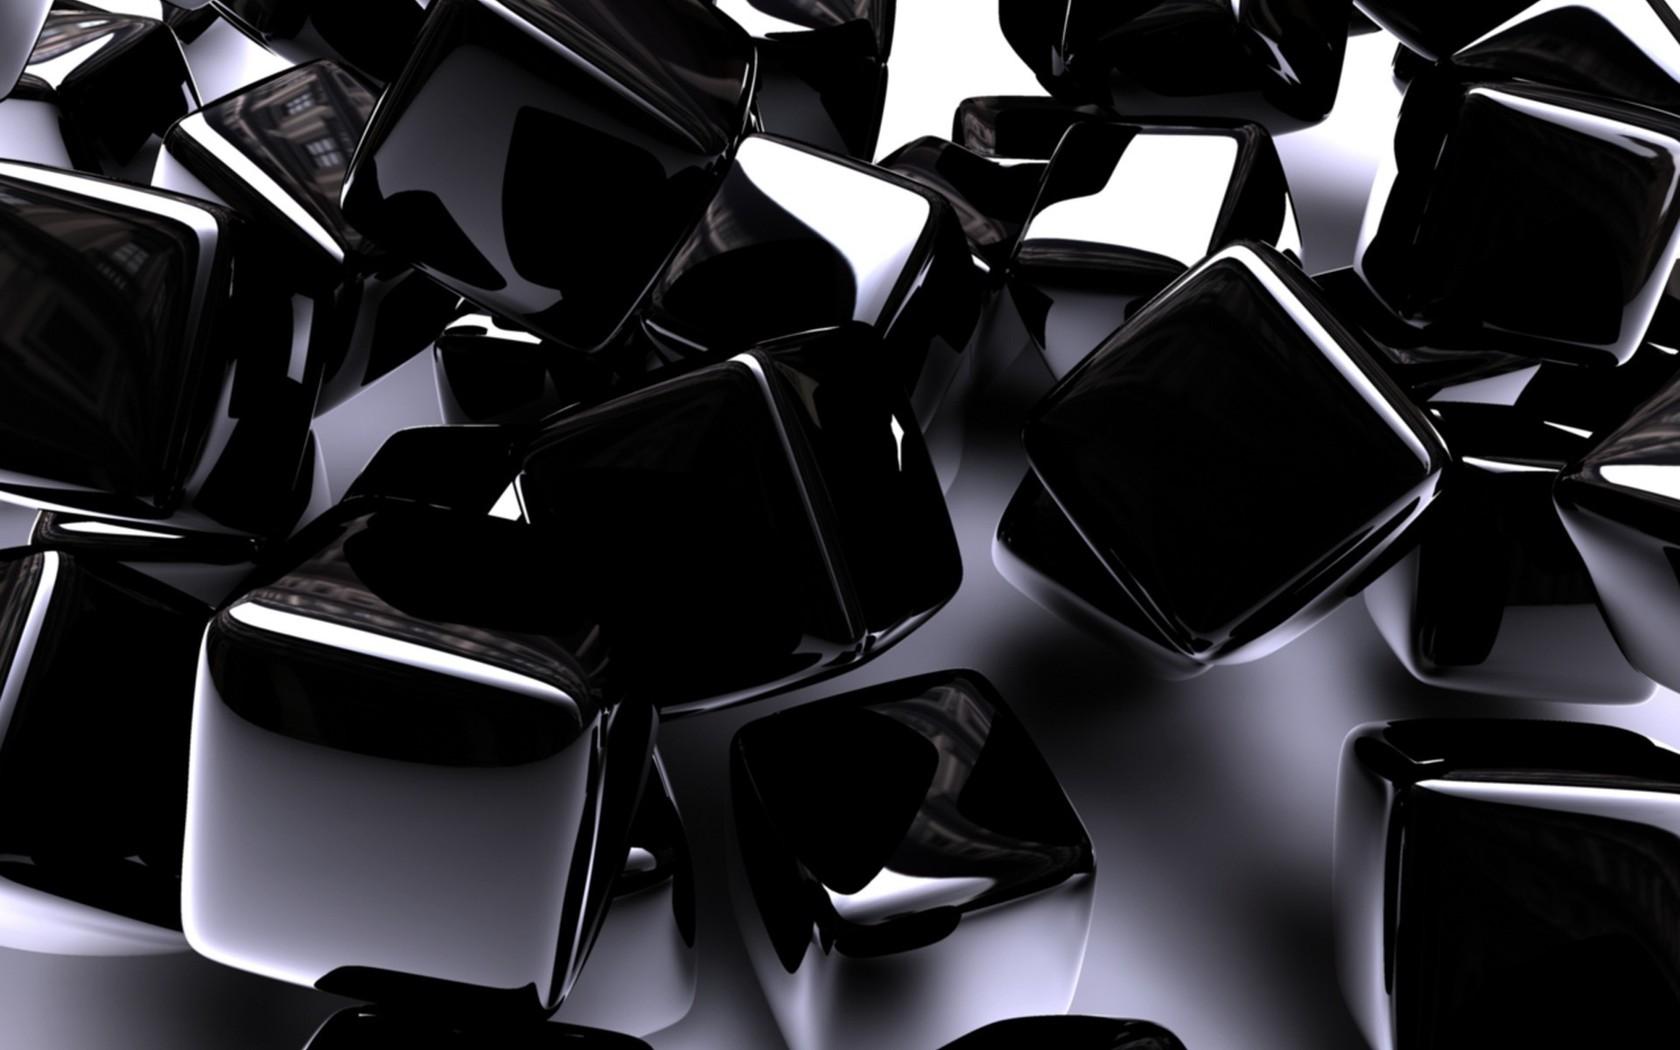 Shiny Black Wallpaper - WallpaperSafari